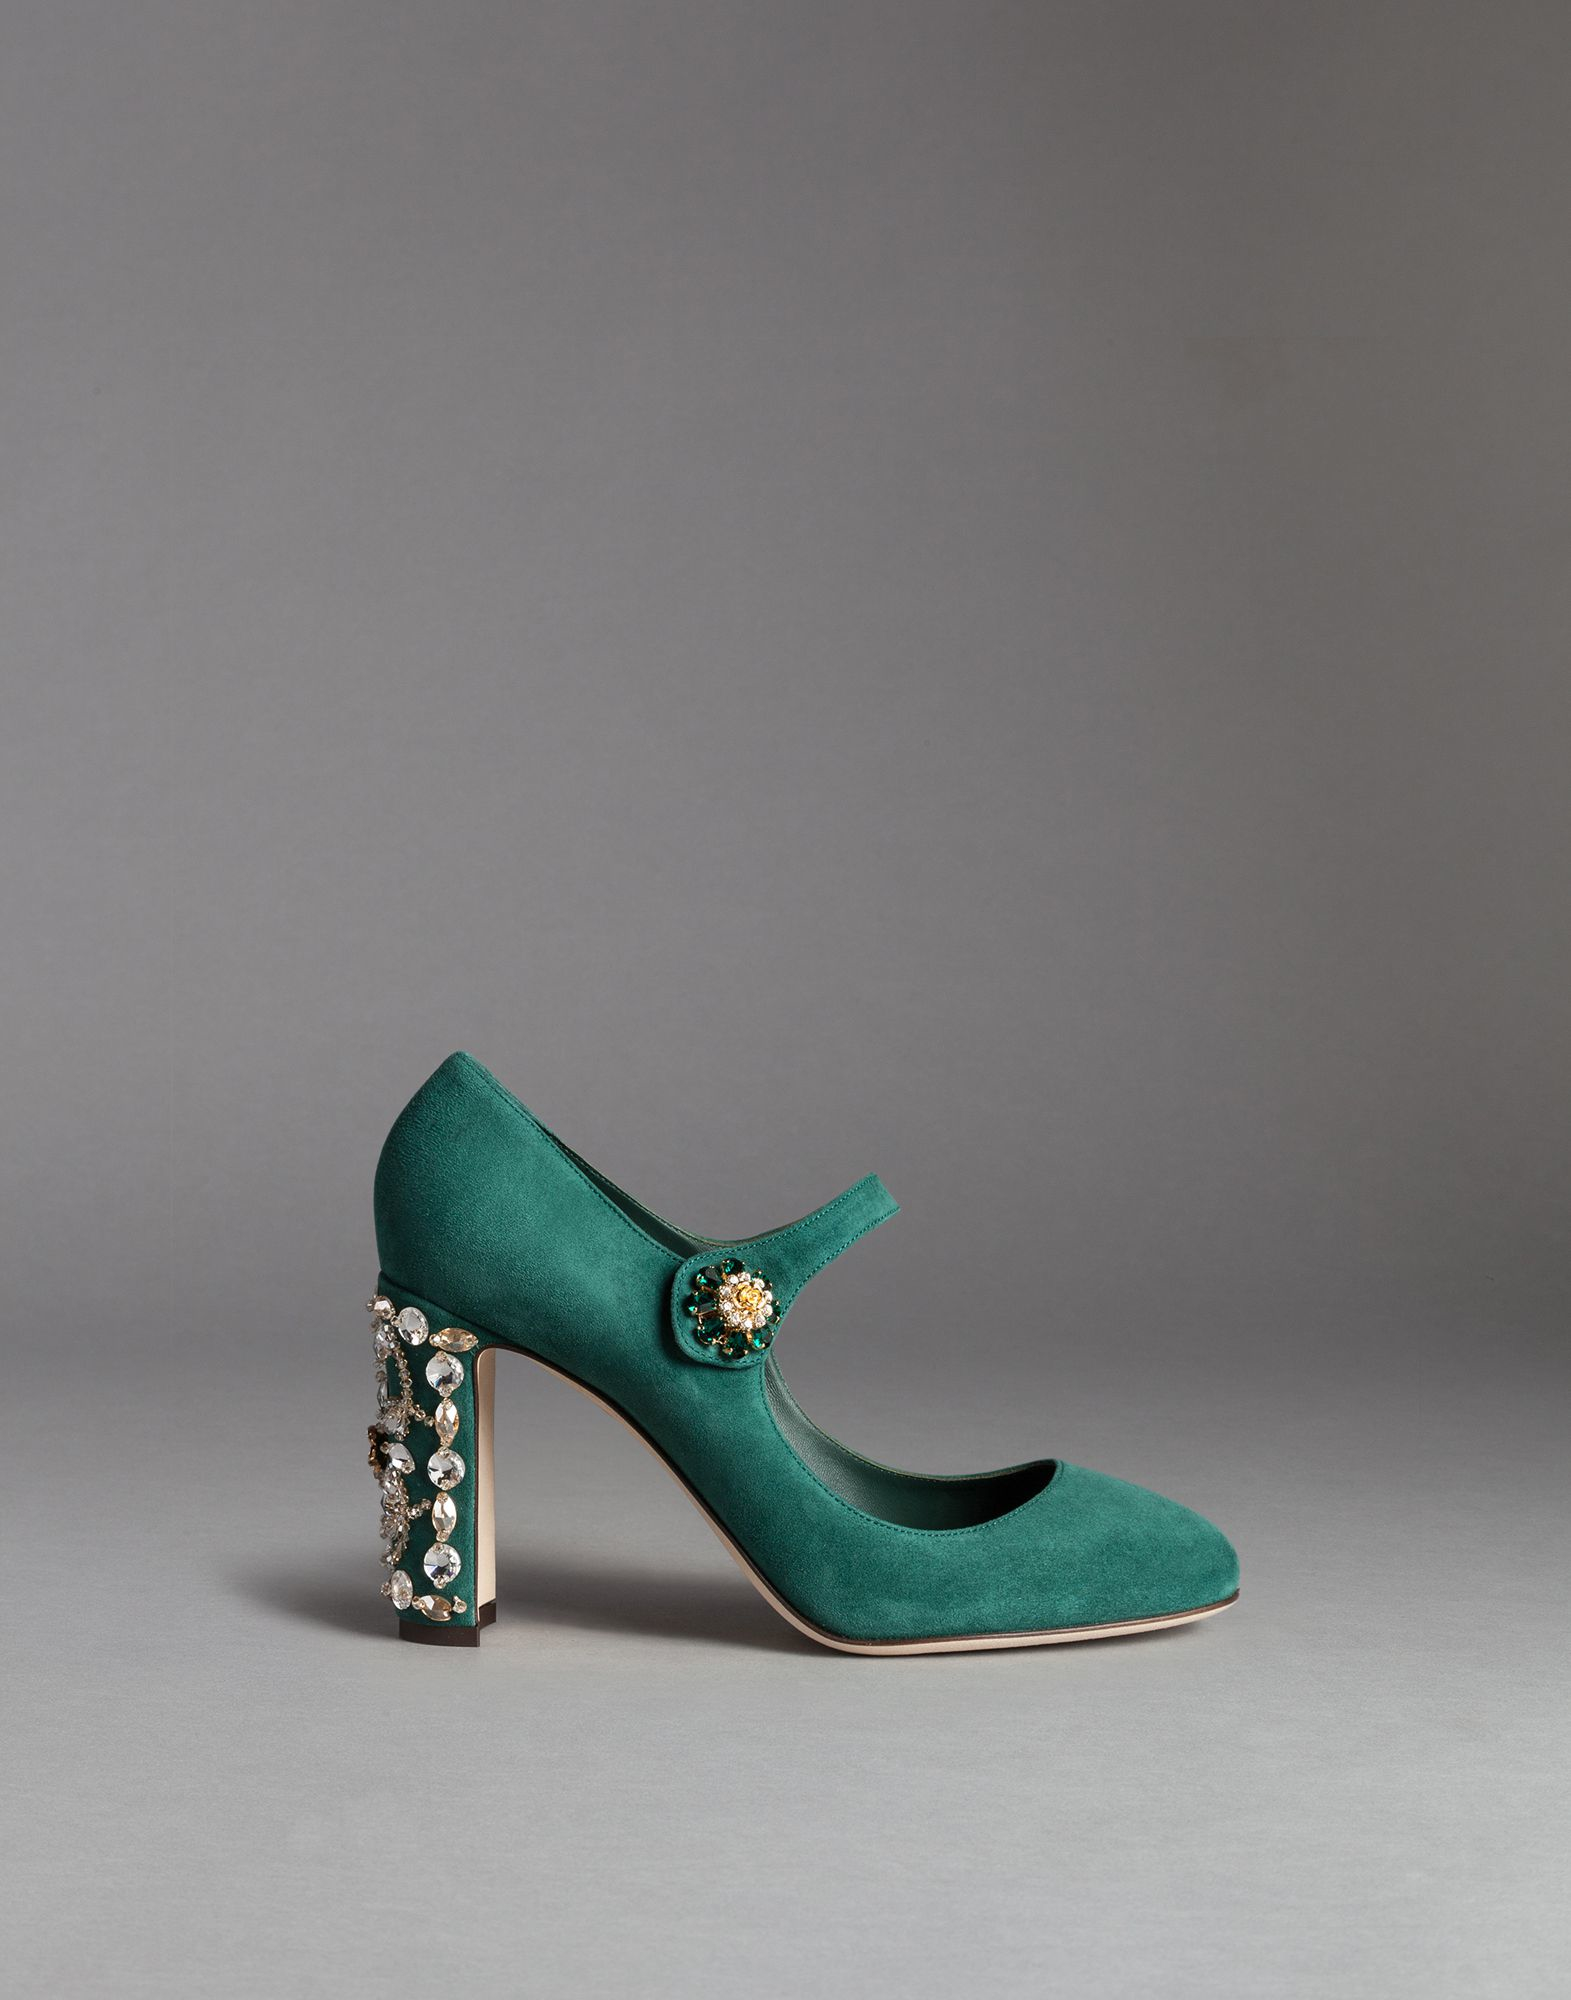 Dolce \u0026 Gabbana Suede Vally Mary Janes